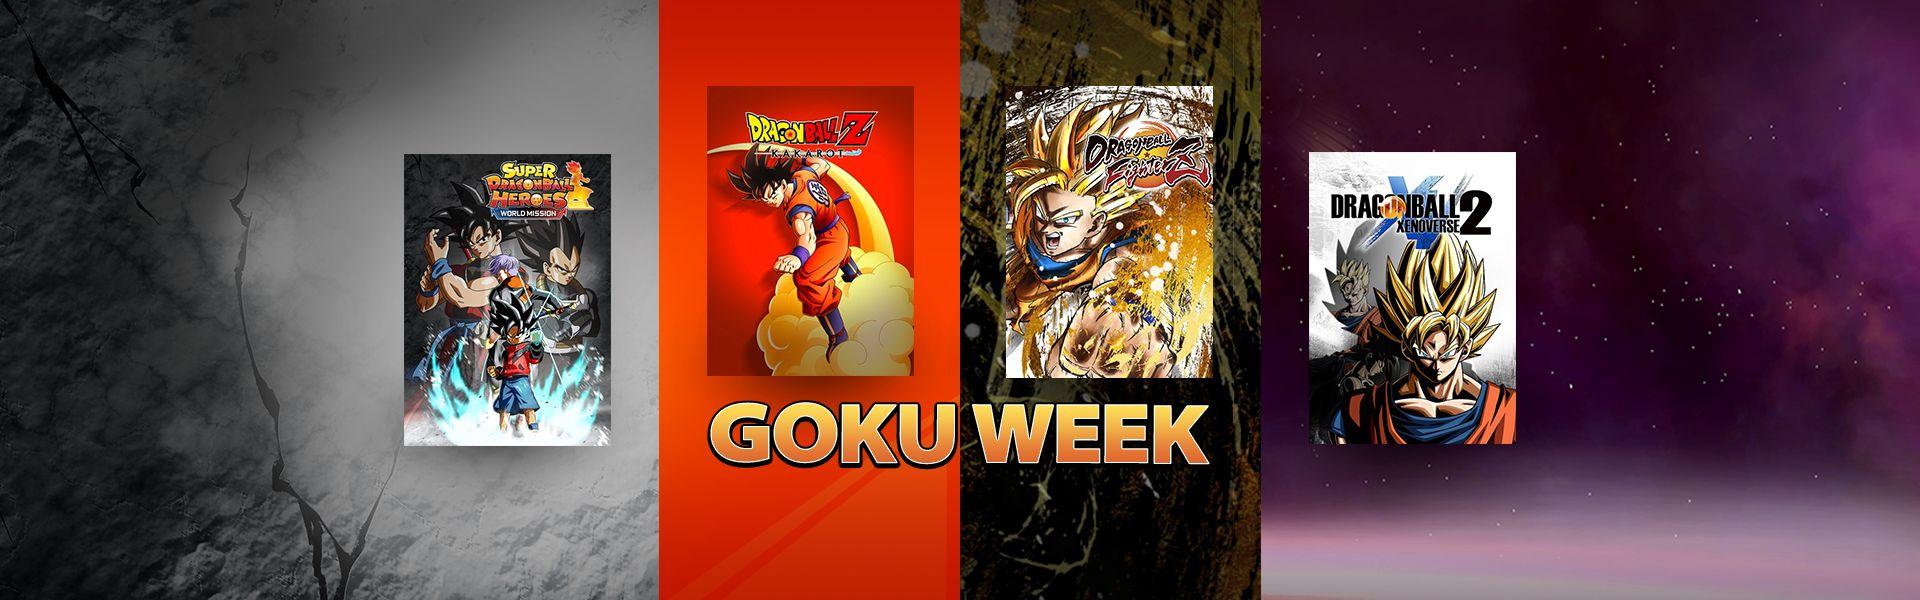 GOKU WEEK: Bis zu 85% rabatt